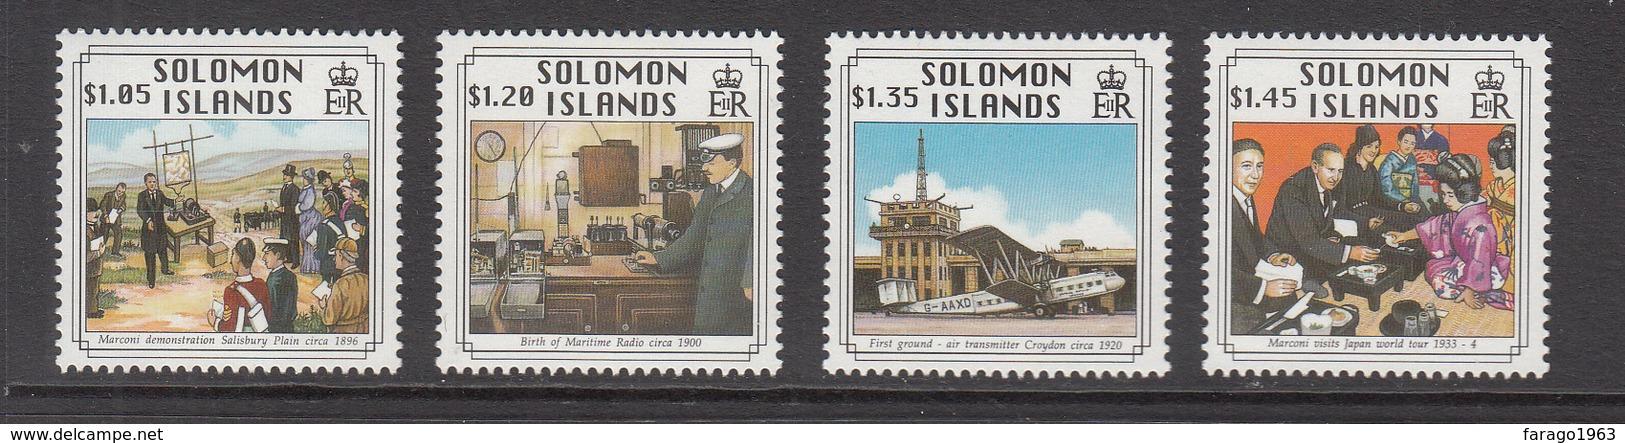 1994 Solomon Islands Marconi Radio Aviation Plane Complete Set Of 4   MNH - Solomon Islands (1978-...)